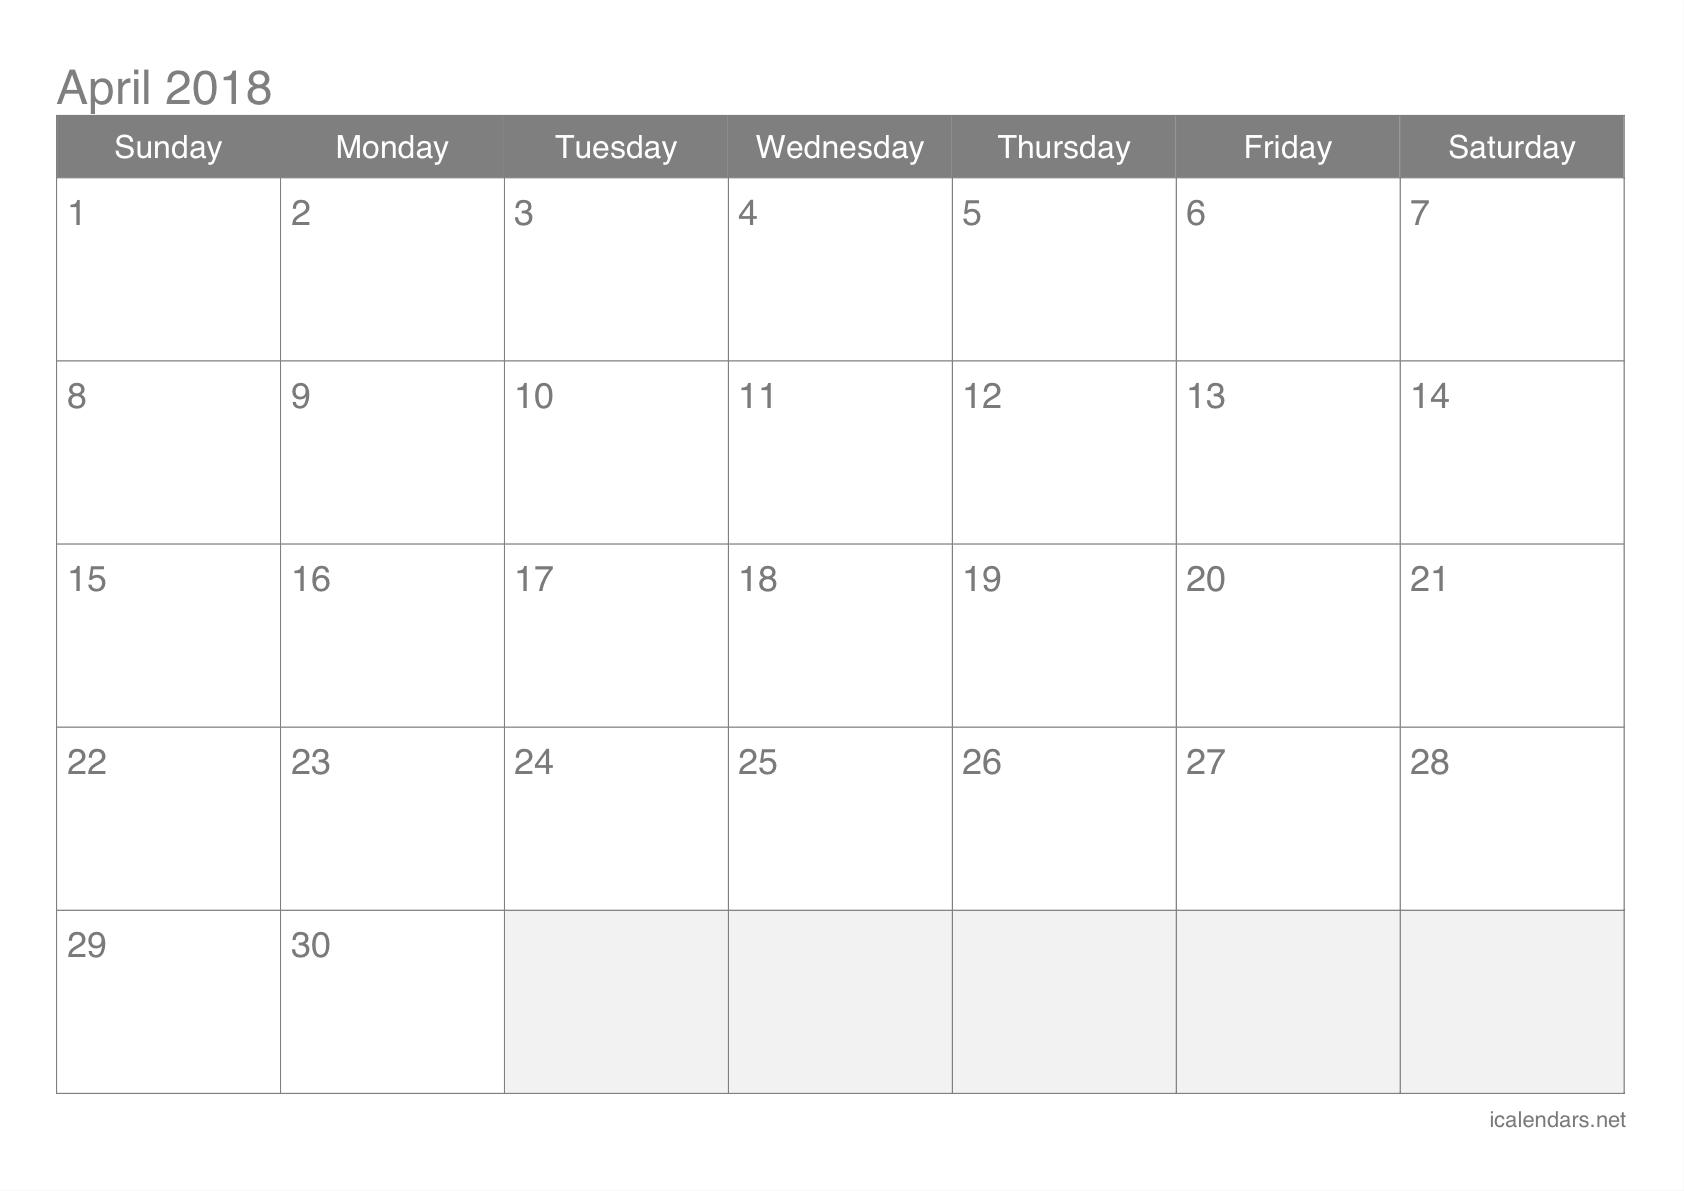 April 2018 Printable Calendar - Icalendars